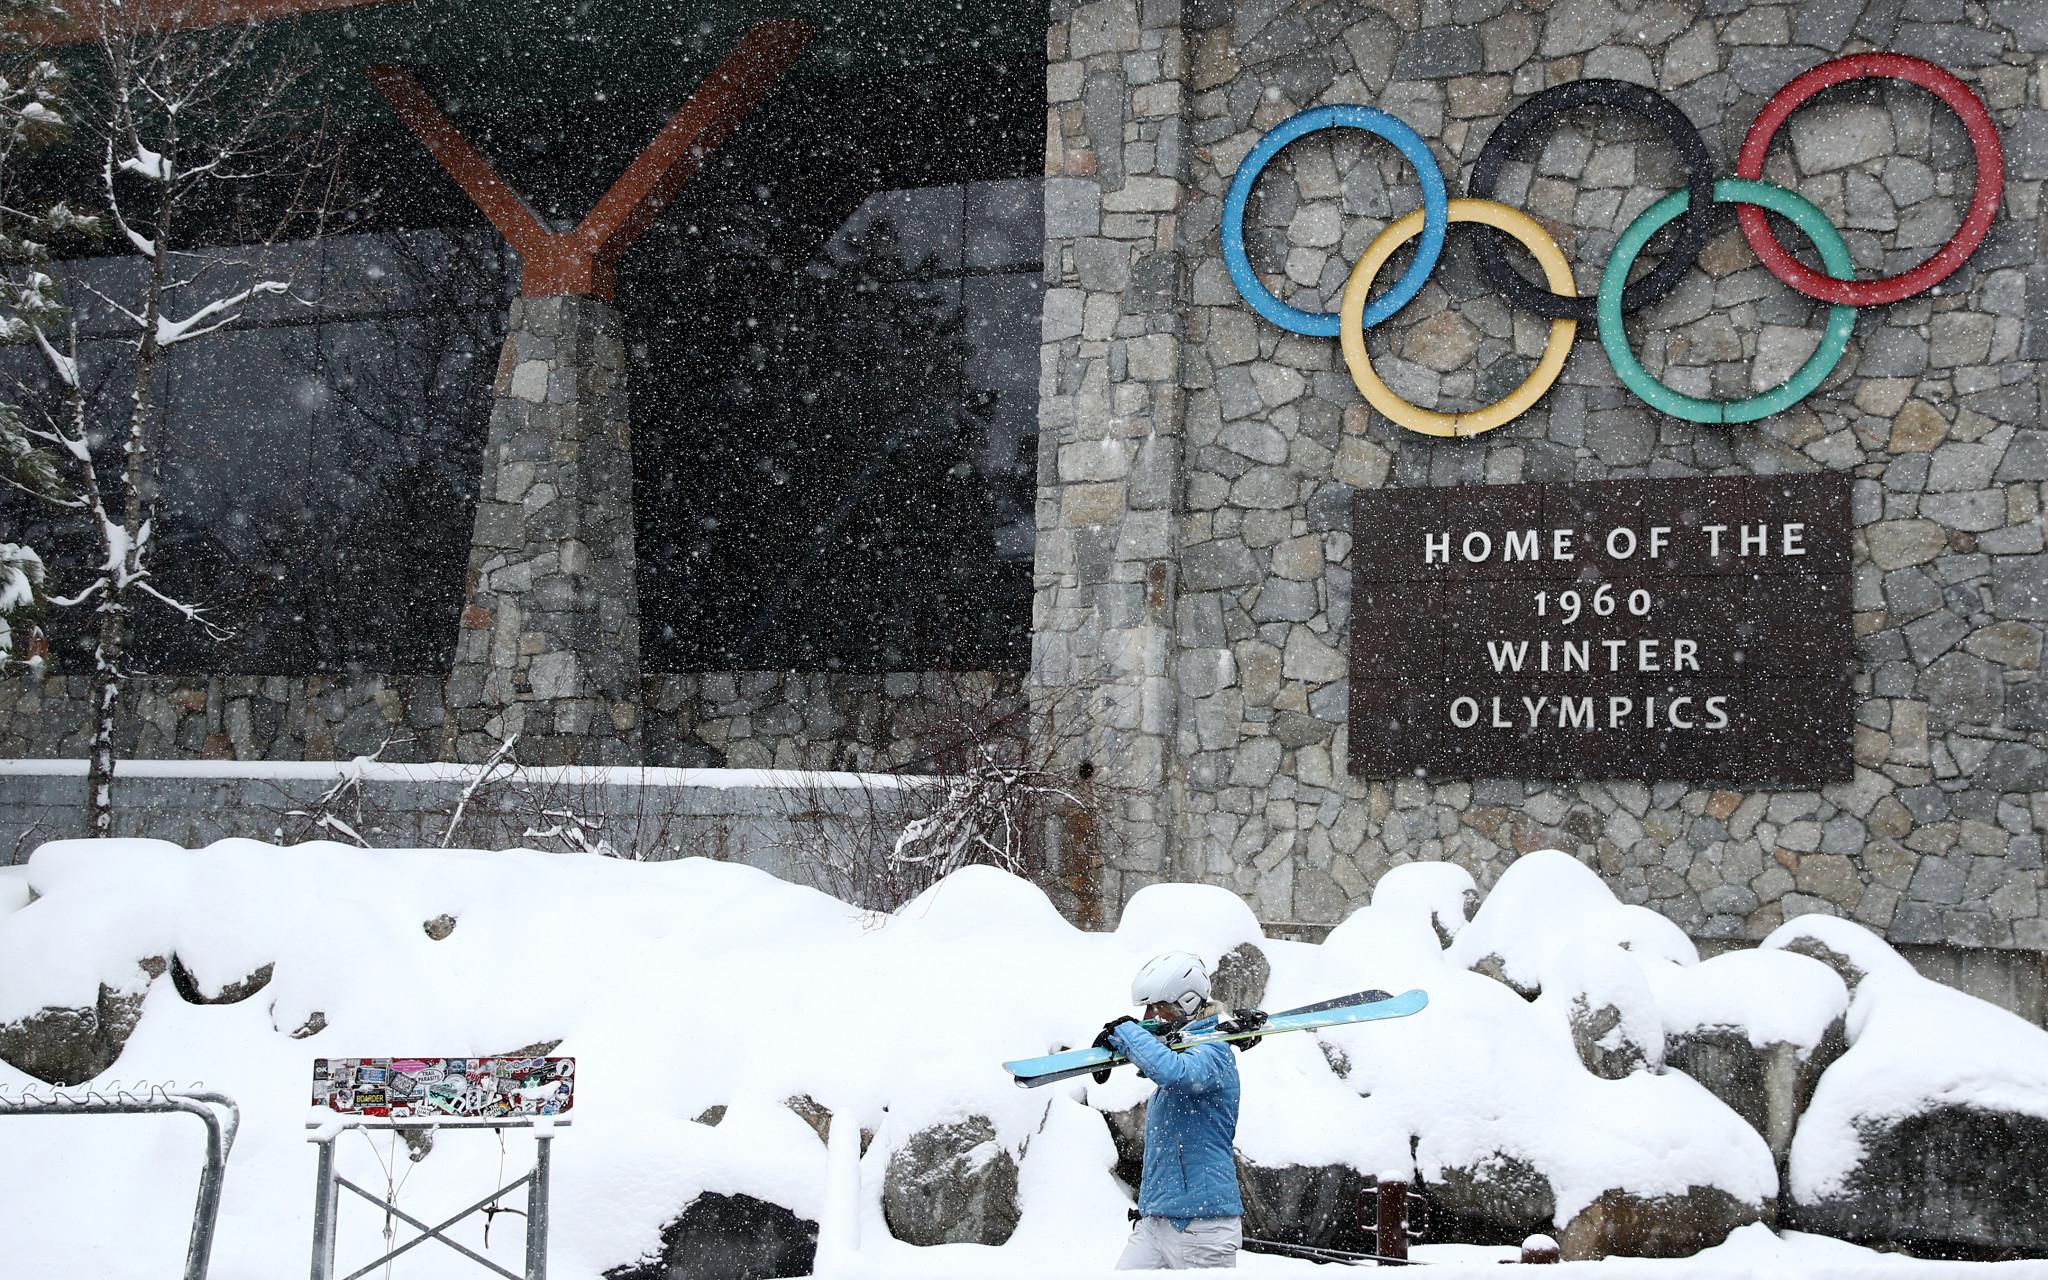 Winter Olympic host Squaw Valley Ski Resort set for name change over derogatory term